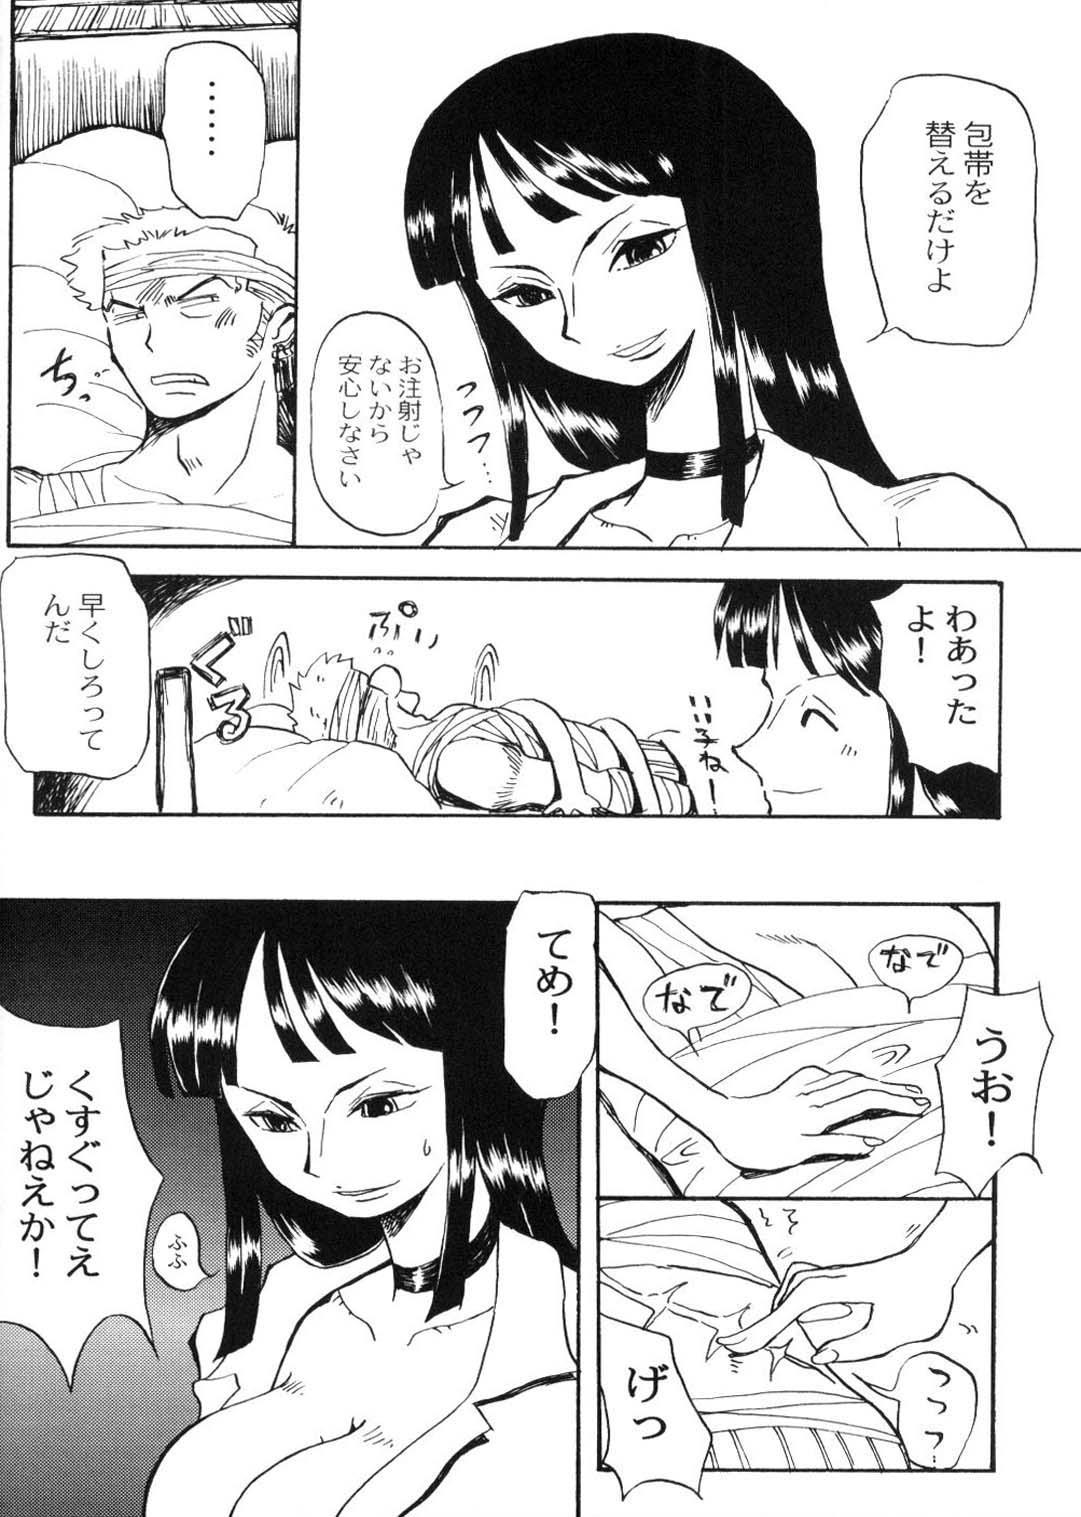 Nicozoro Namicho 7